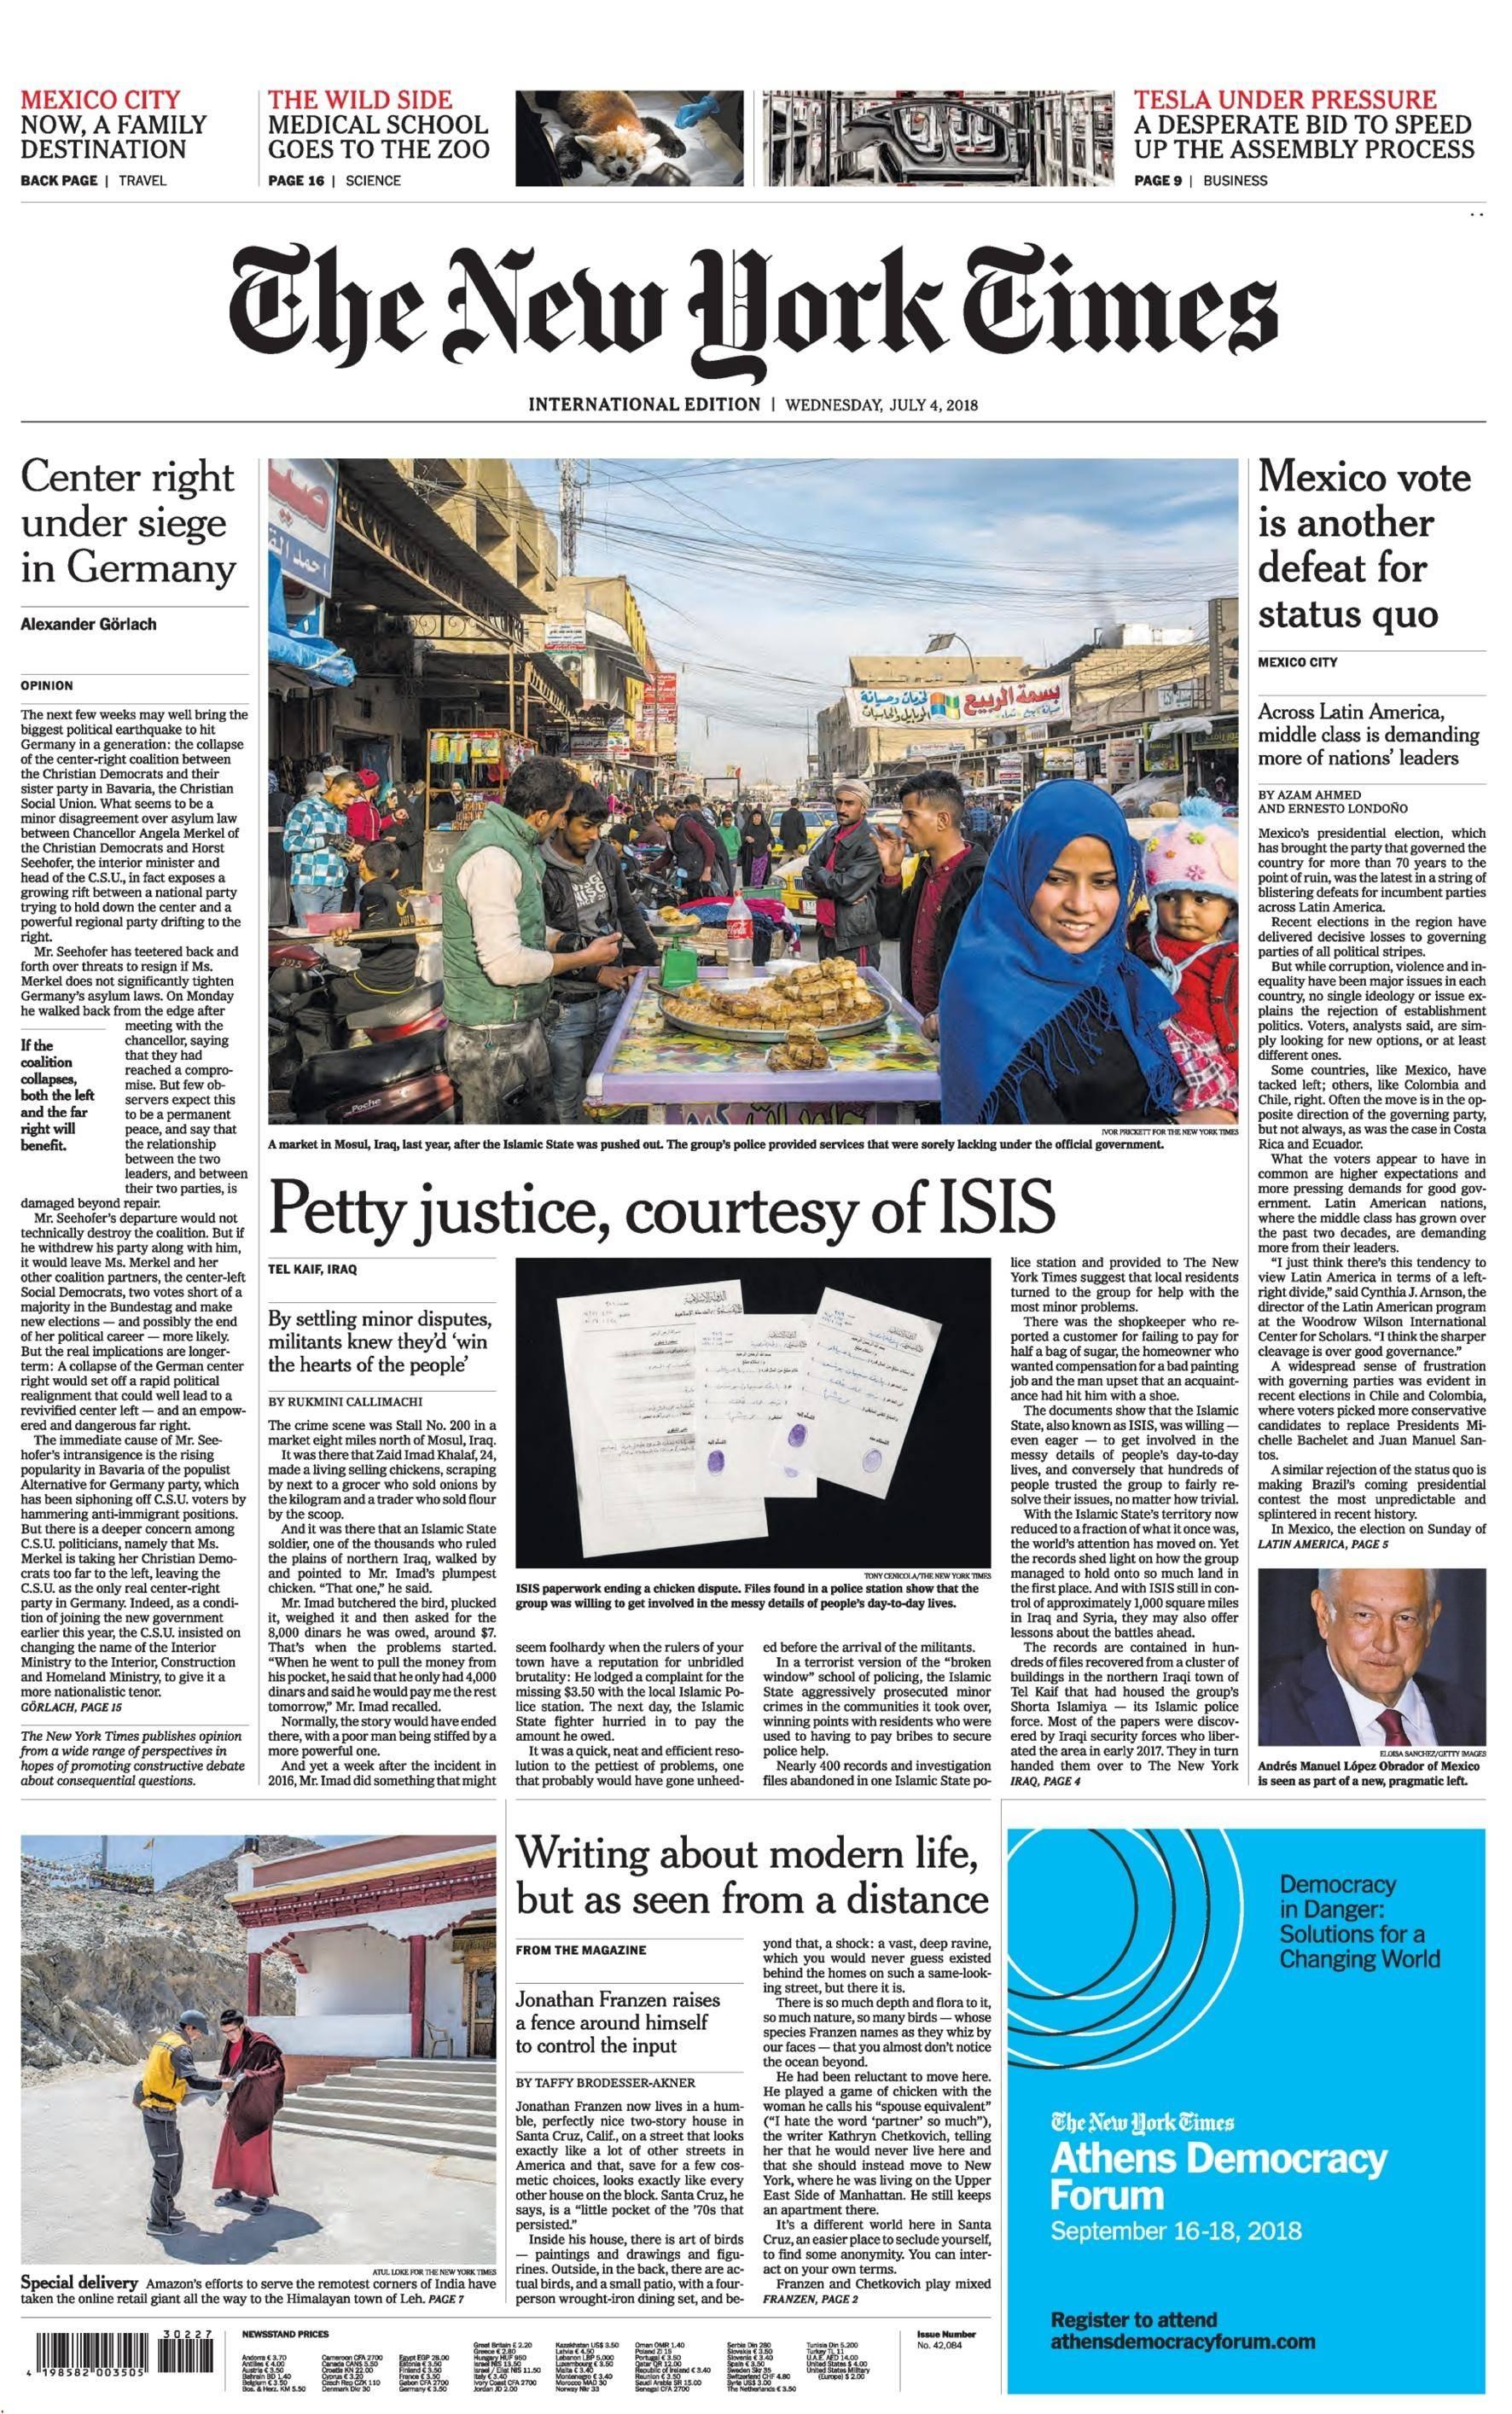 International New York Times - 04 July 2018